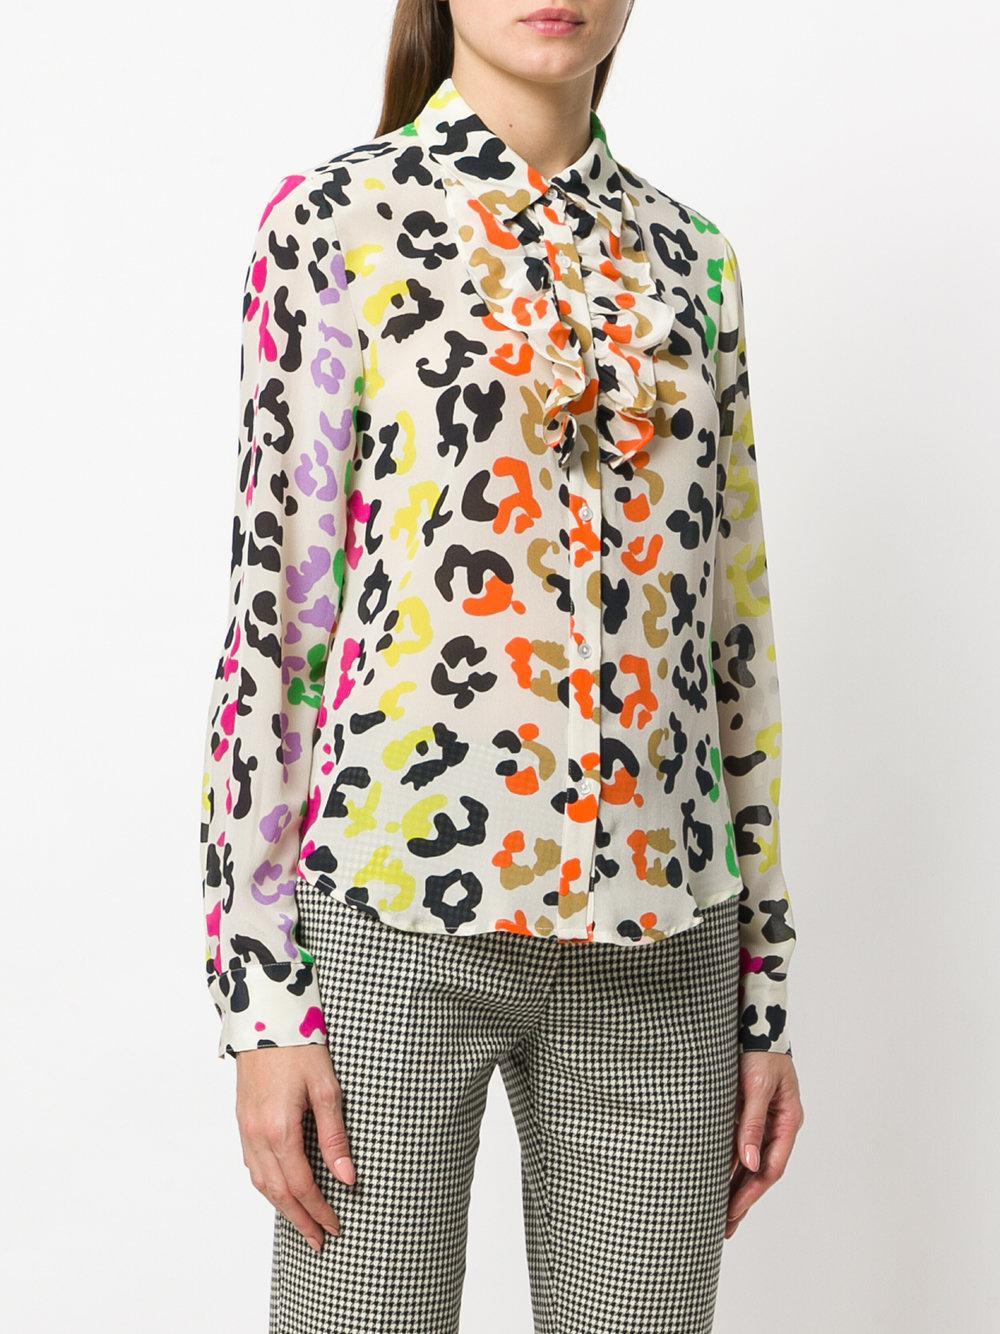 5c87a1b89b60 Essentiel Antwerp Leopard Print Ruffle Shirt - Lyst